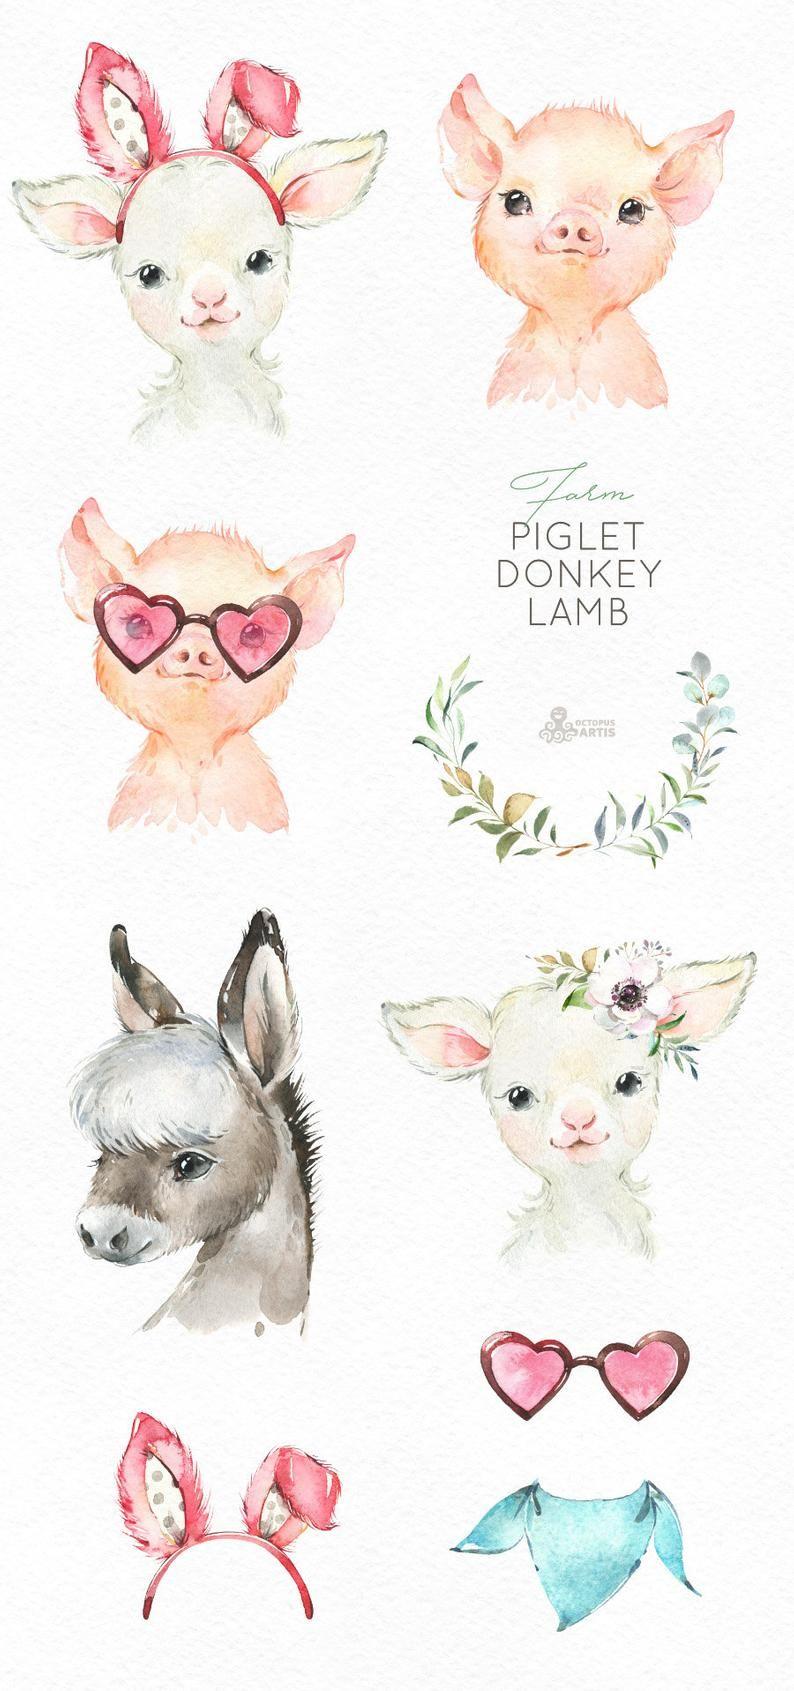 Farm Piglet Donkey Lamb Watercolor Little Animals Clipart Etsy Baby Animal Drawings Animal Clipart Baby Farm Animals